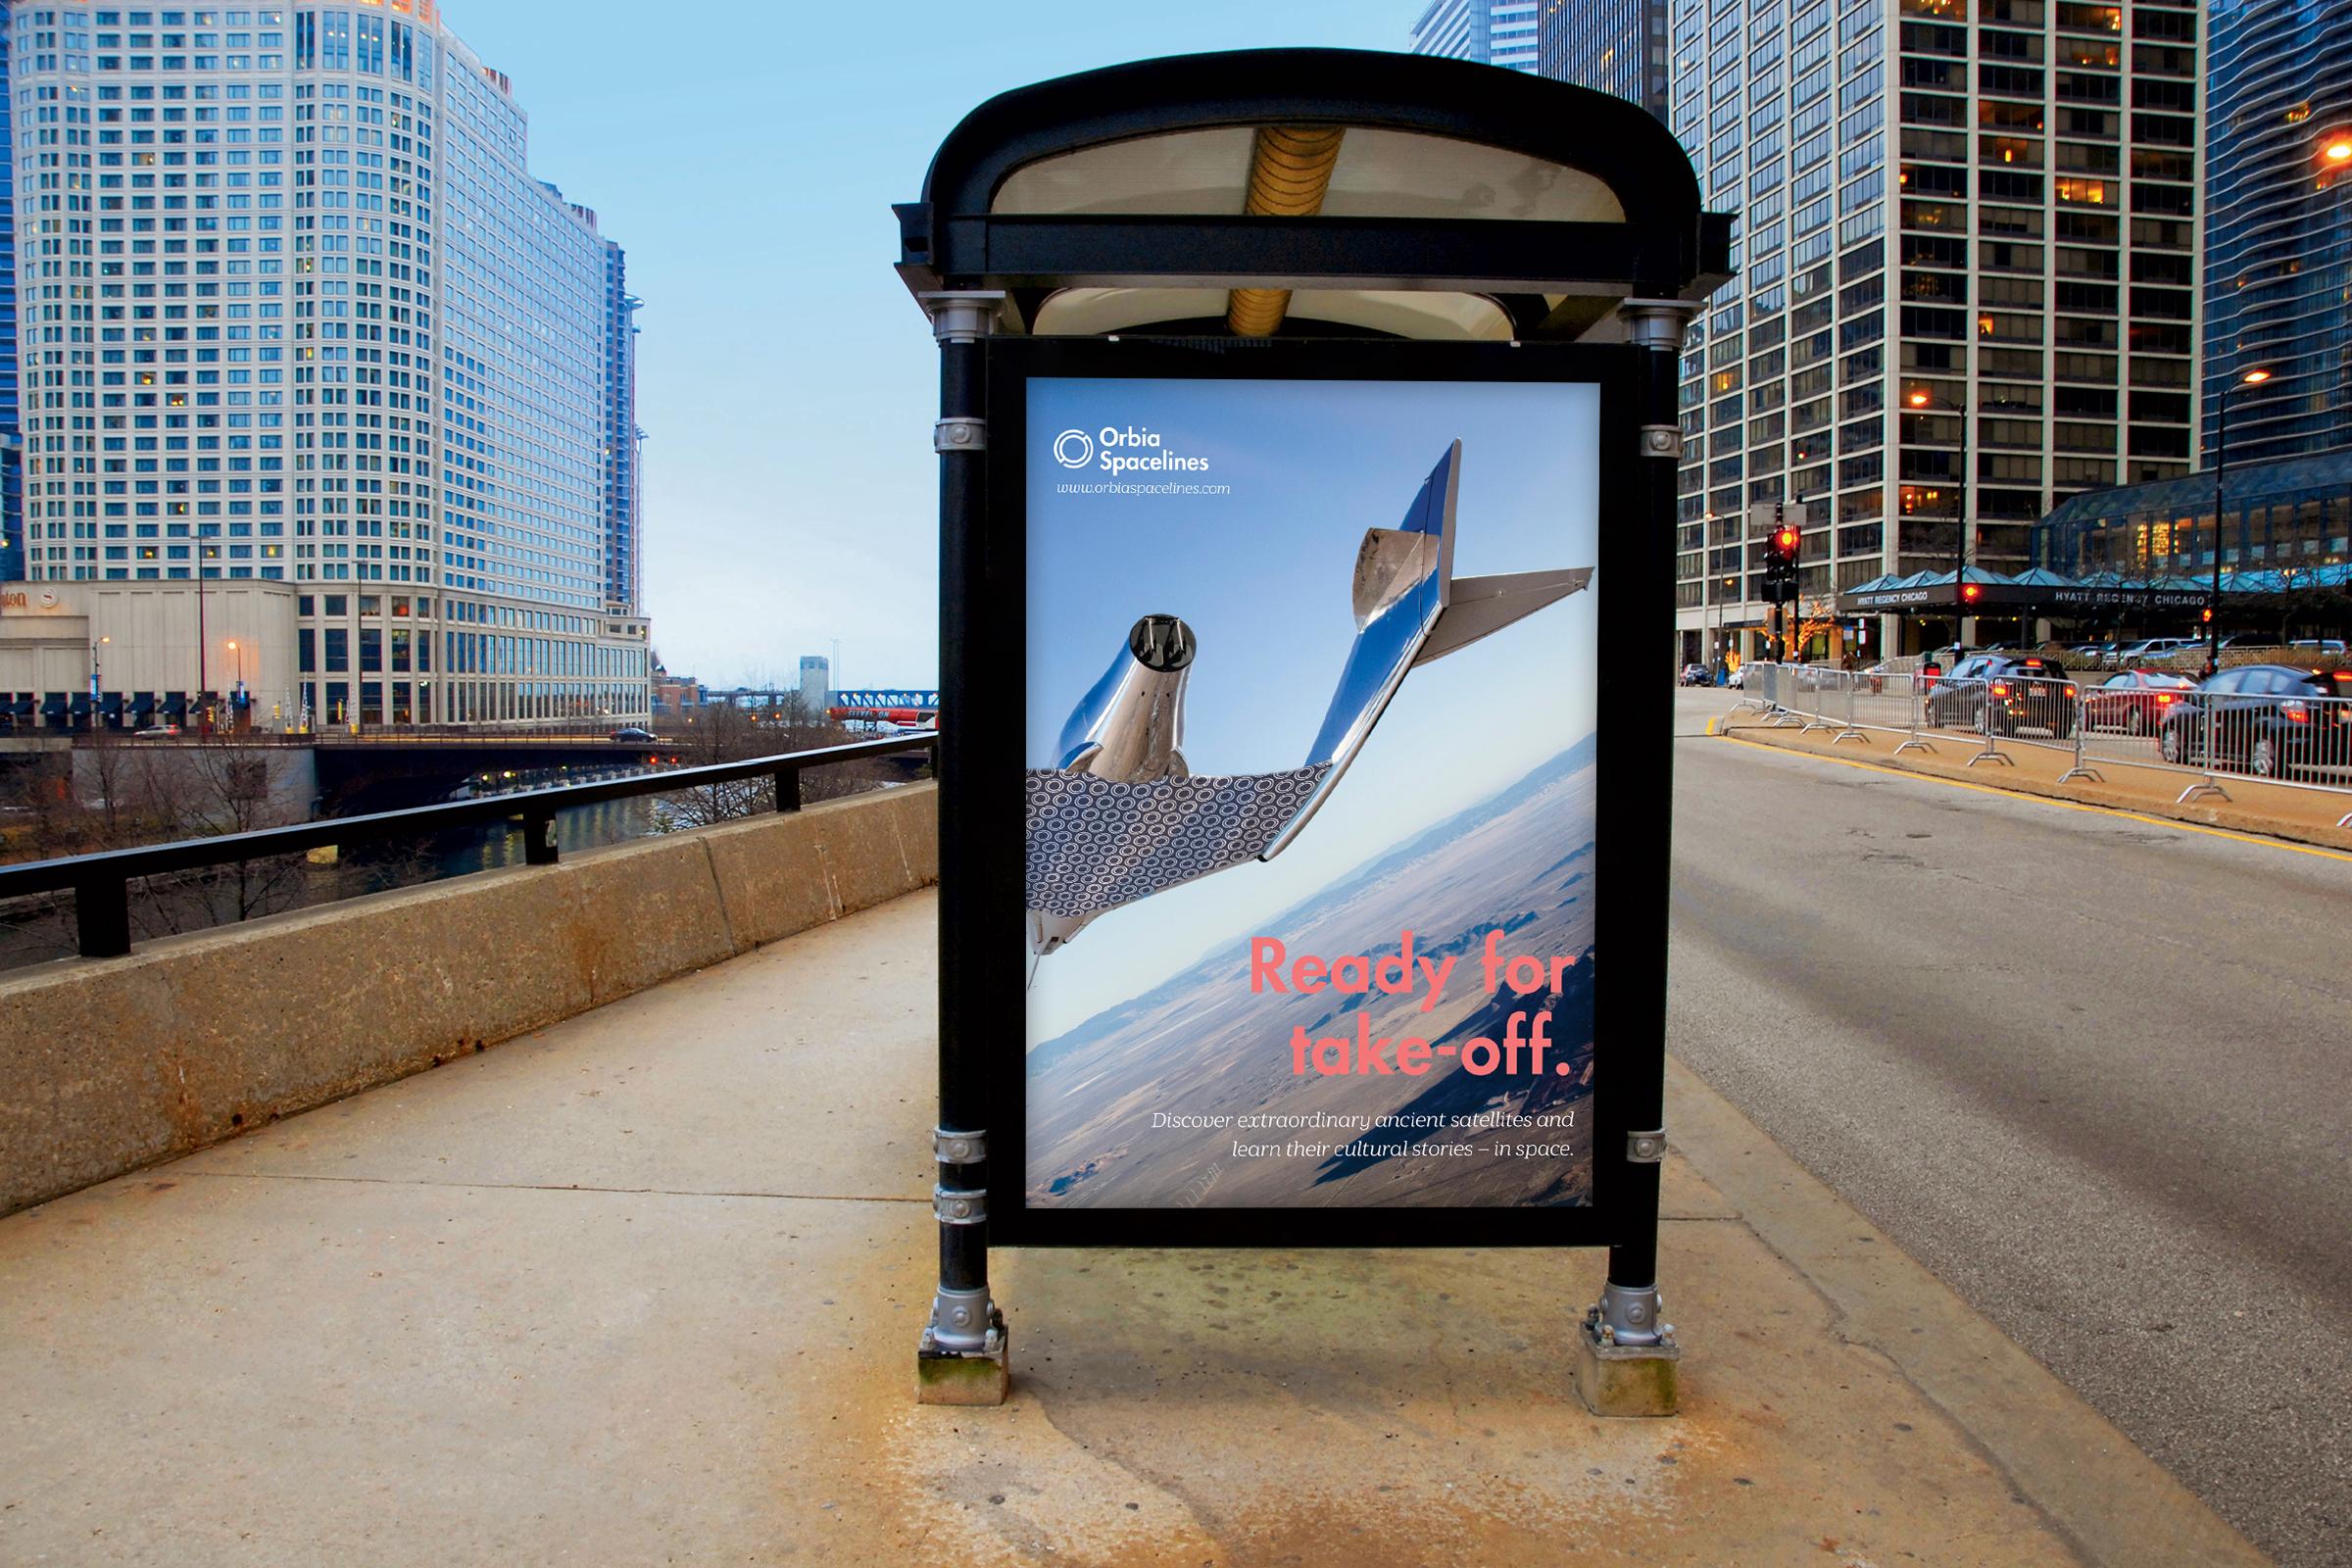 Free-Bus-Shelter-Outdoor-Advertising-Mockup-PSD-File.jpg